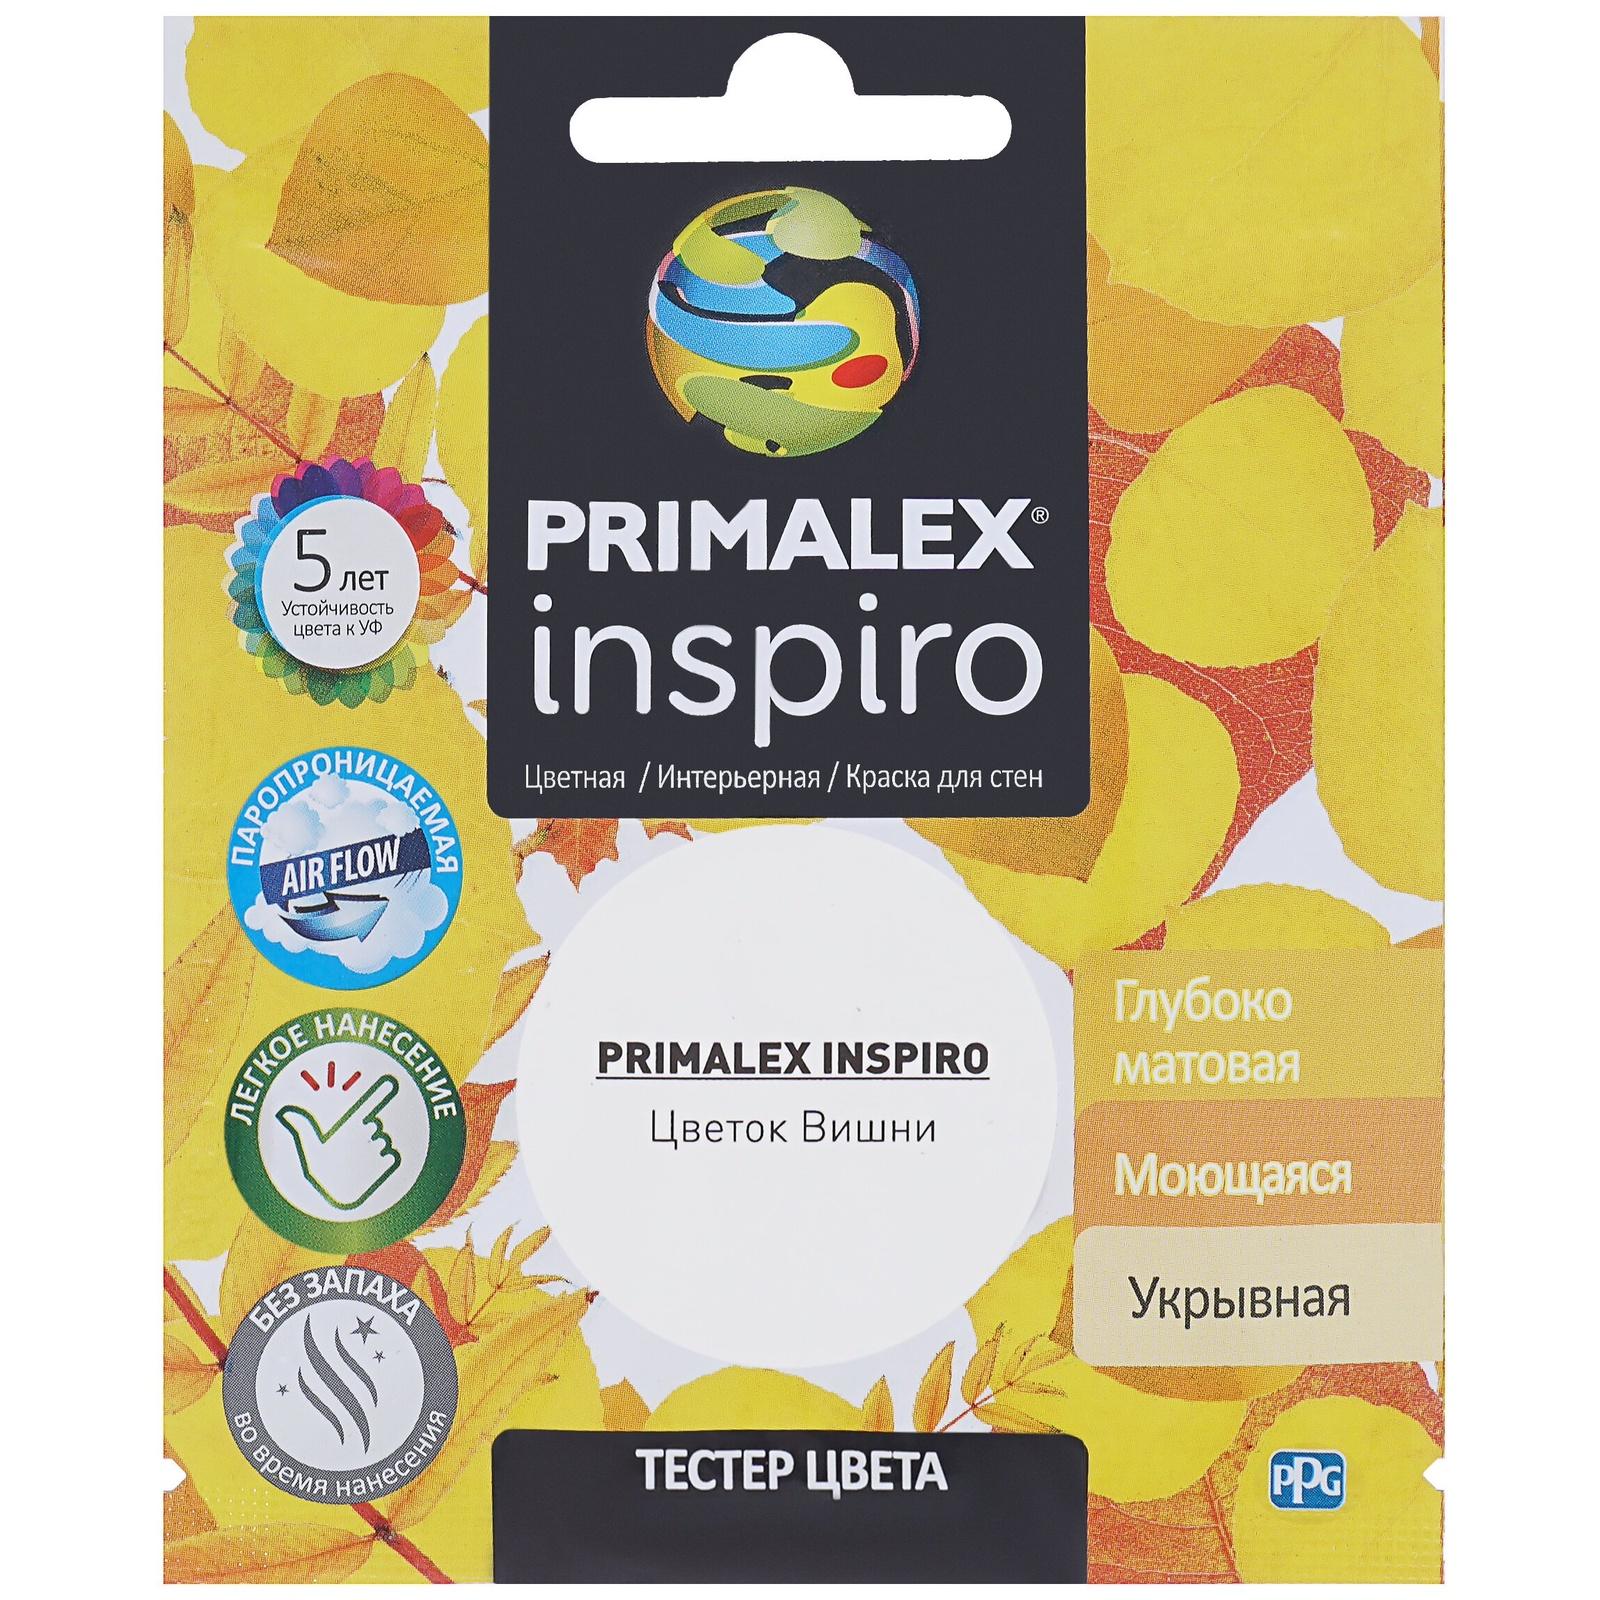 Краска Primalex Inspiro Цветок Вишни 40мл краска ppg primalex inspiro красный мак 40мл pmx i47